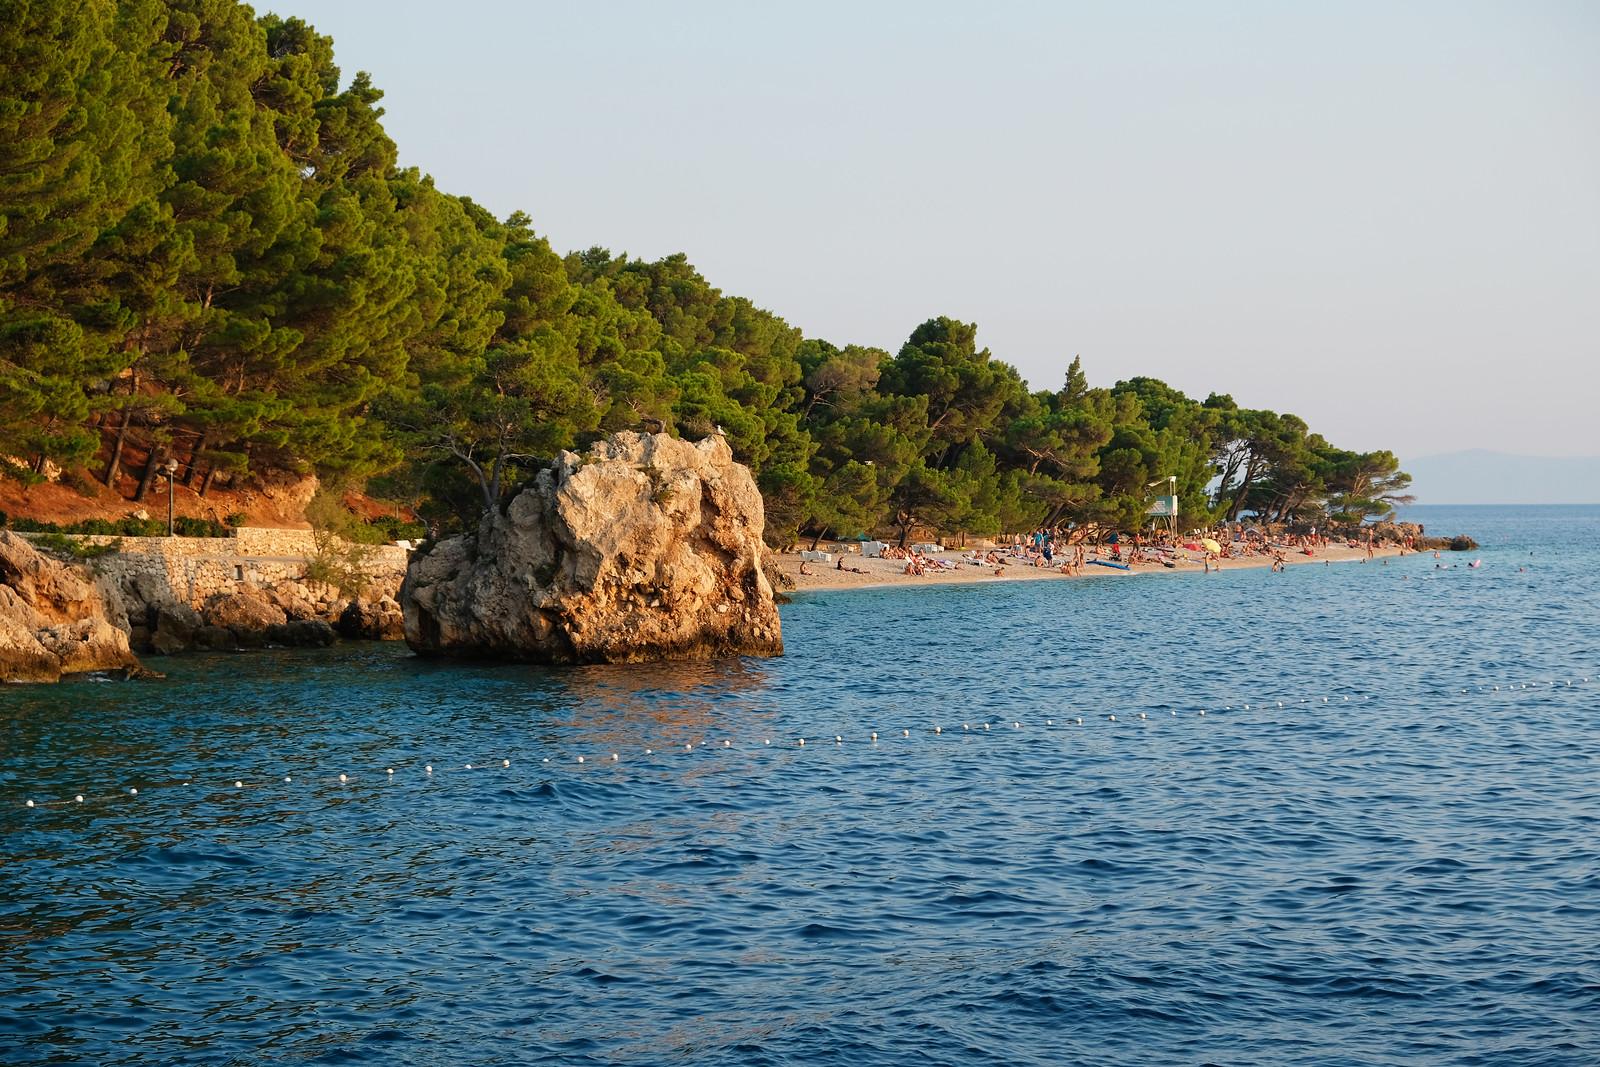 Punta Rata Beach, Brela, Makarska Riviera, Croatia